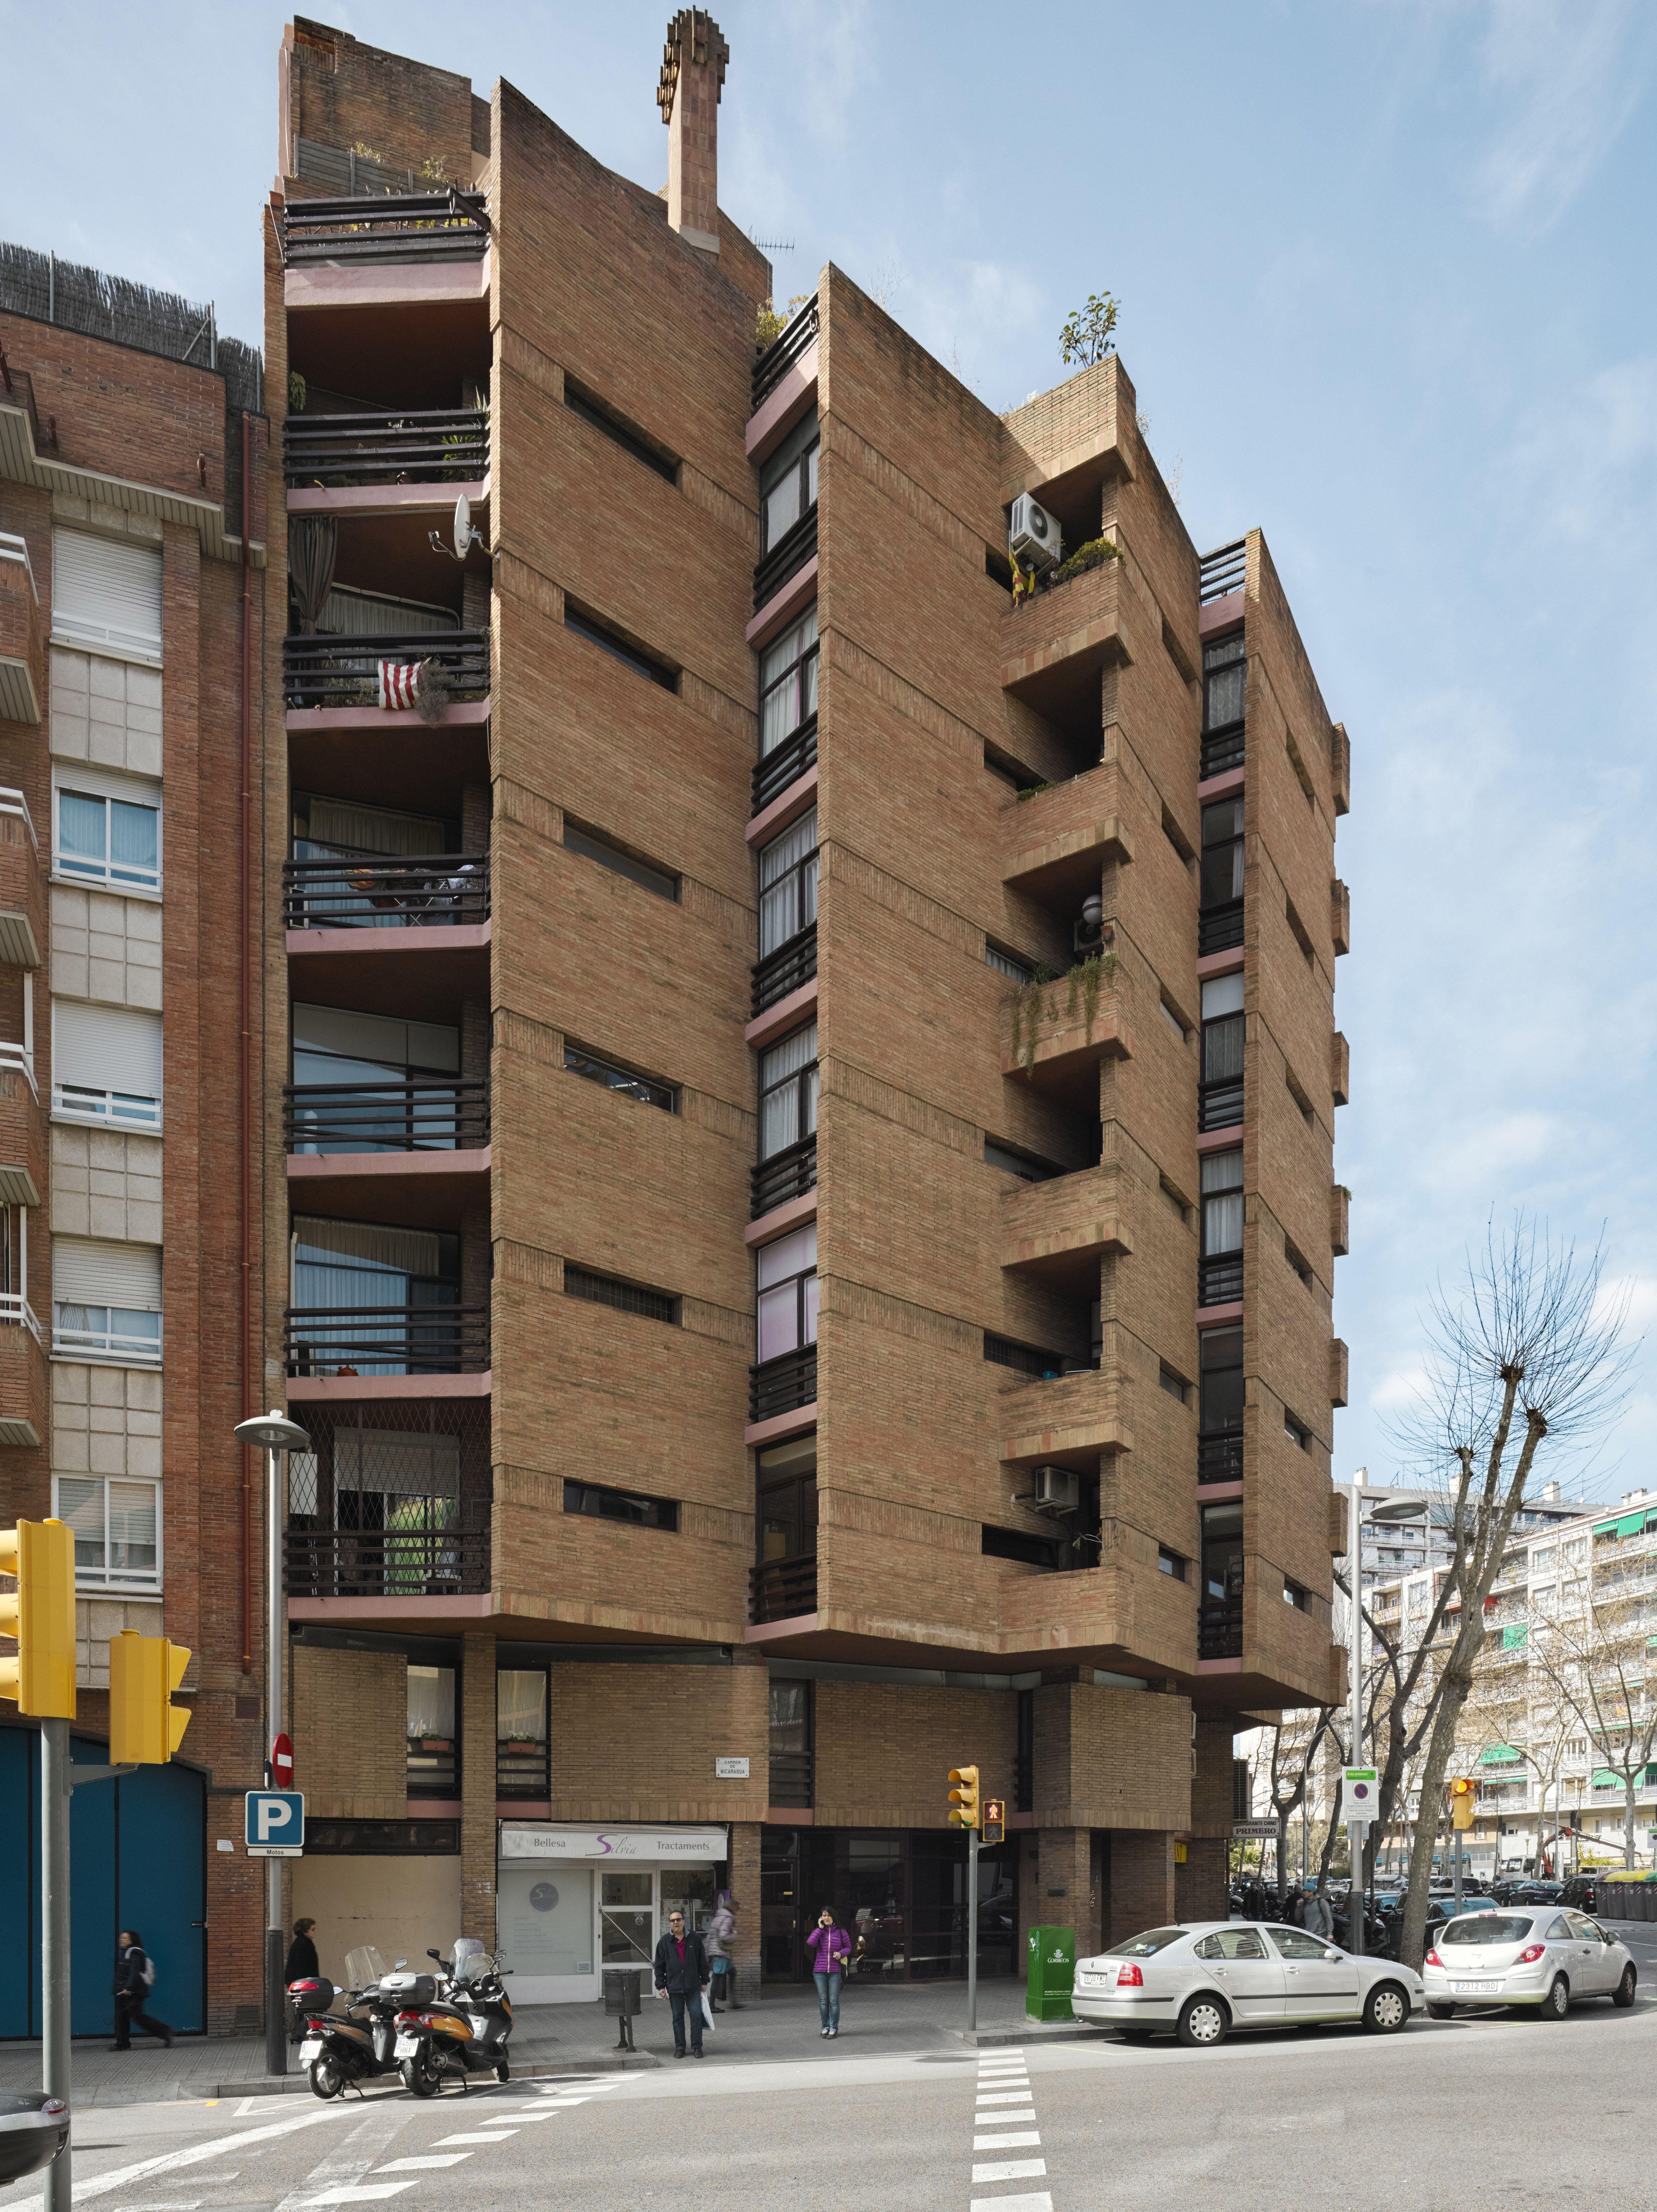 nicaragua apartment building in barcelona spain ricardo bofill taller de arquitectura ricardo. Black Bedroom Furniture Sets. Home Design Ideas